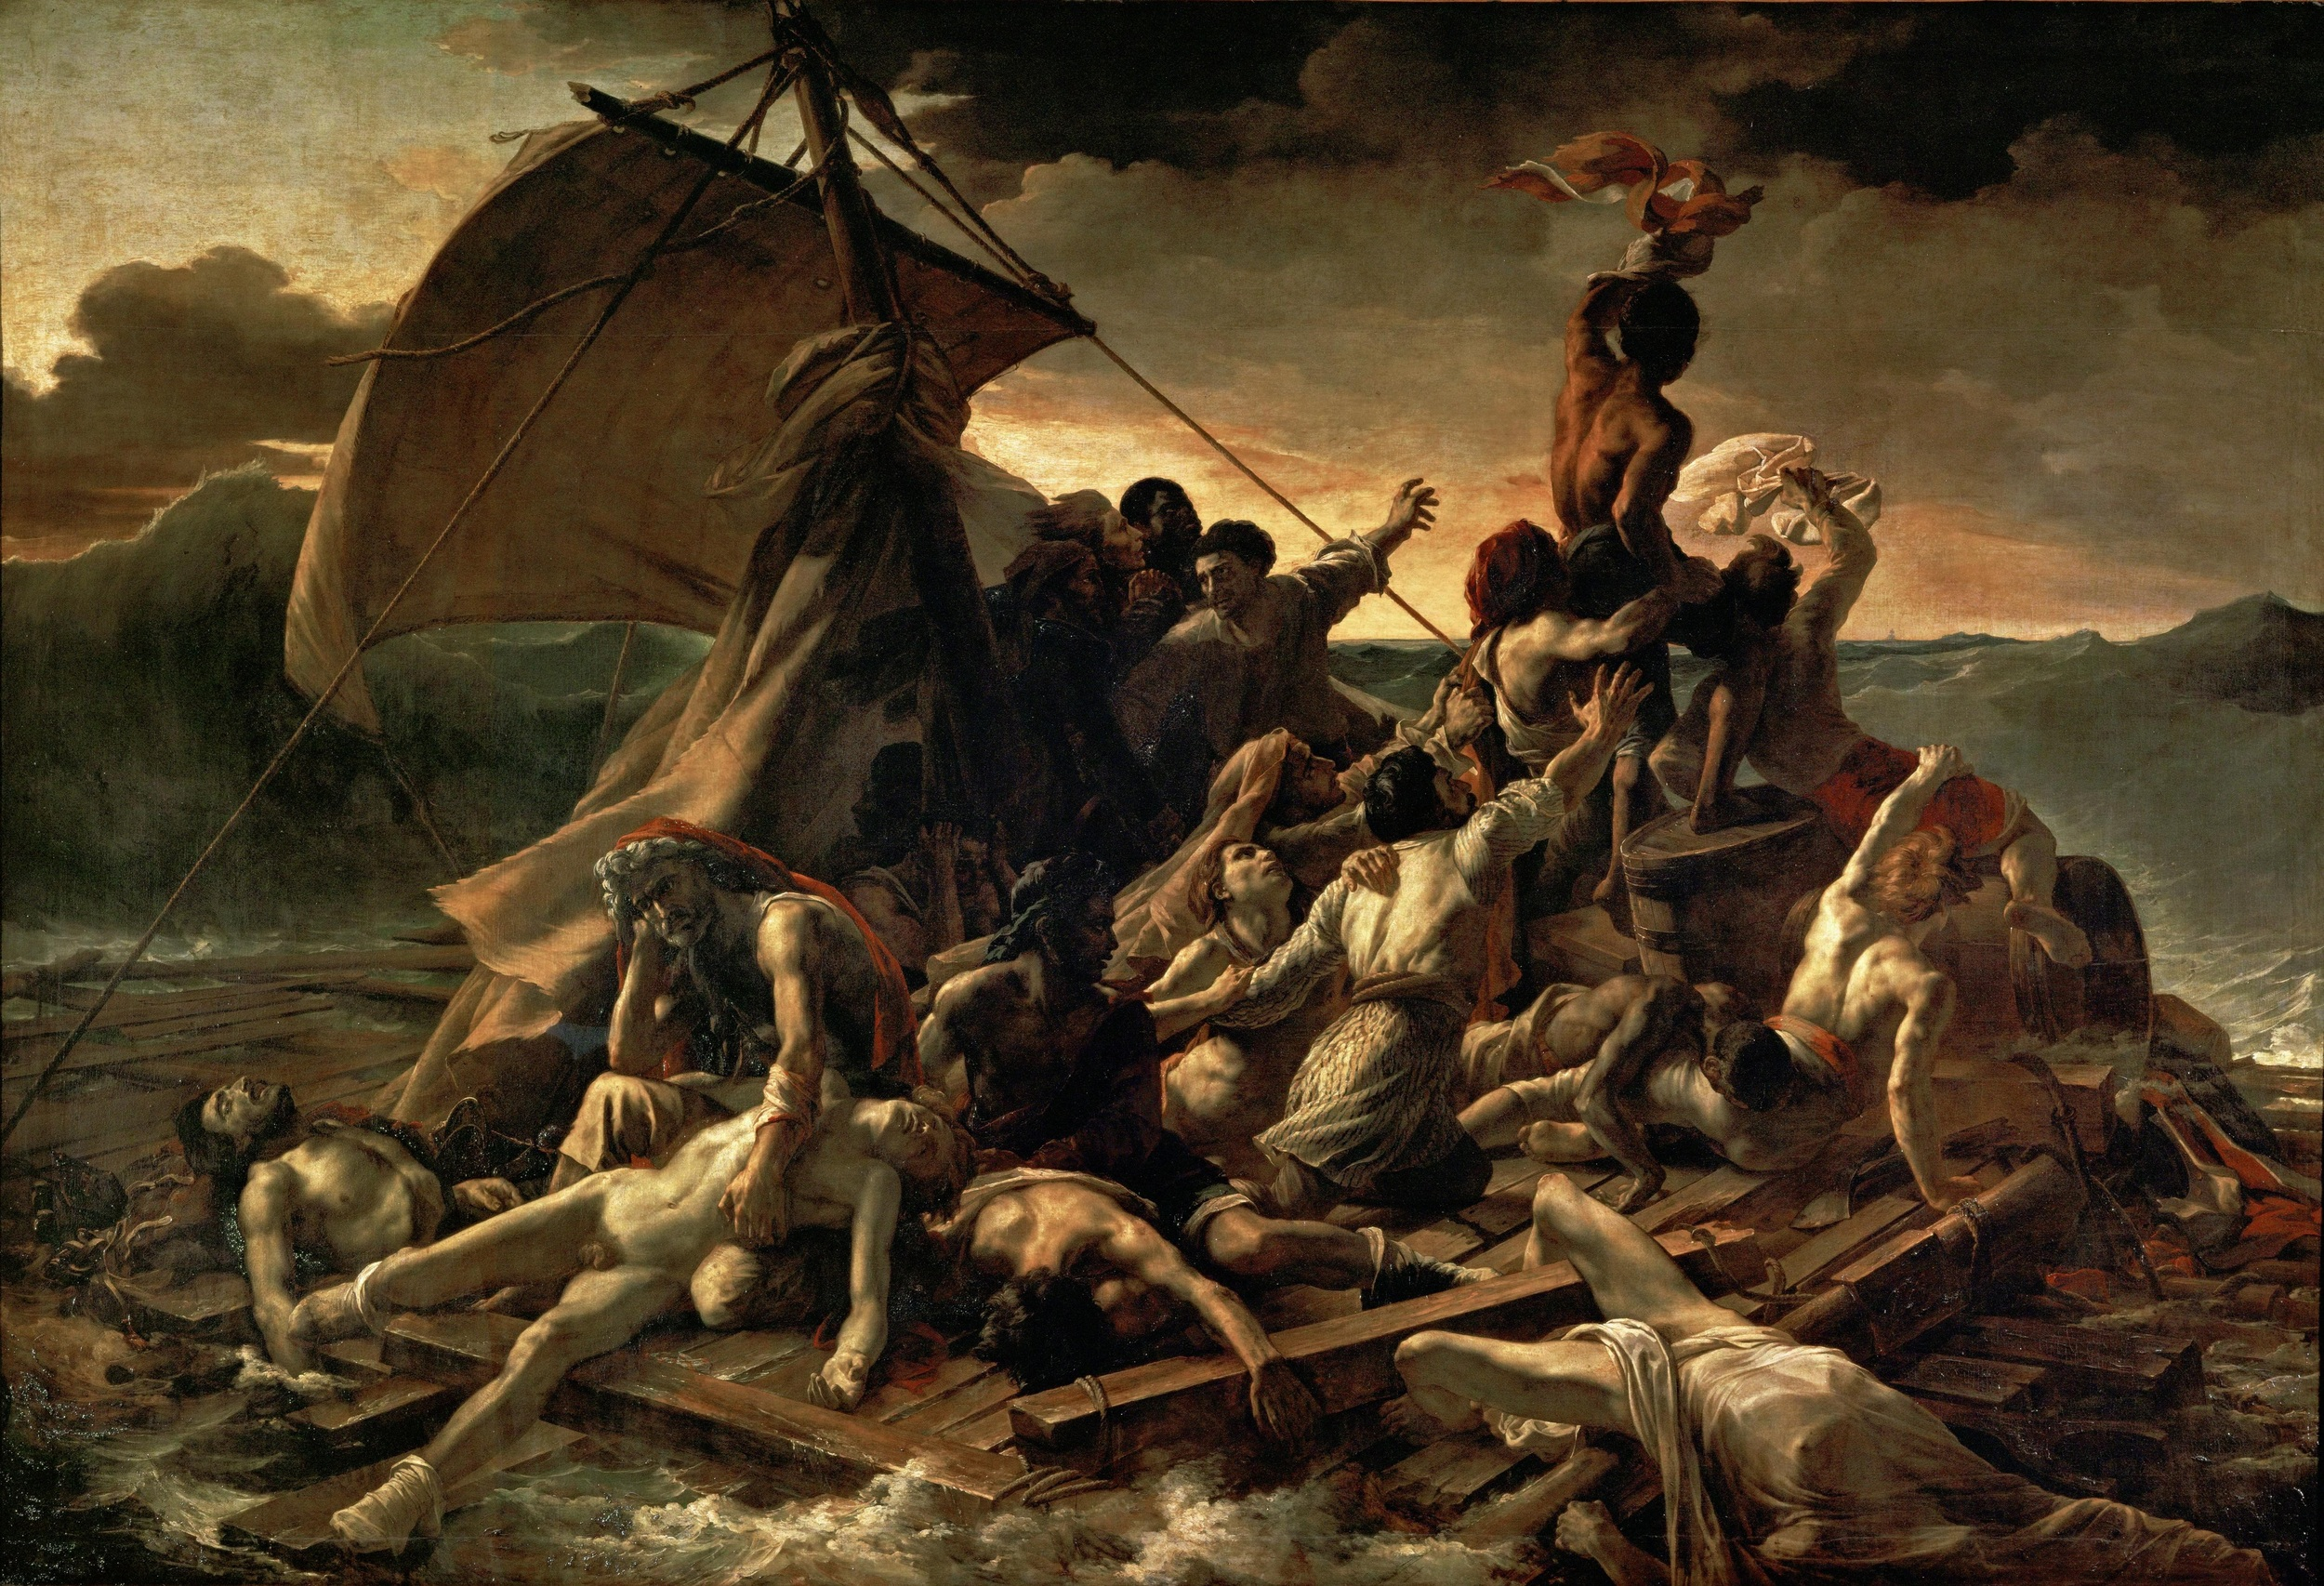 The Raft of the Medusa by Jean Thèodore Gericault.